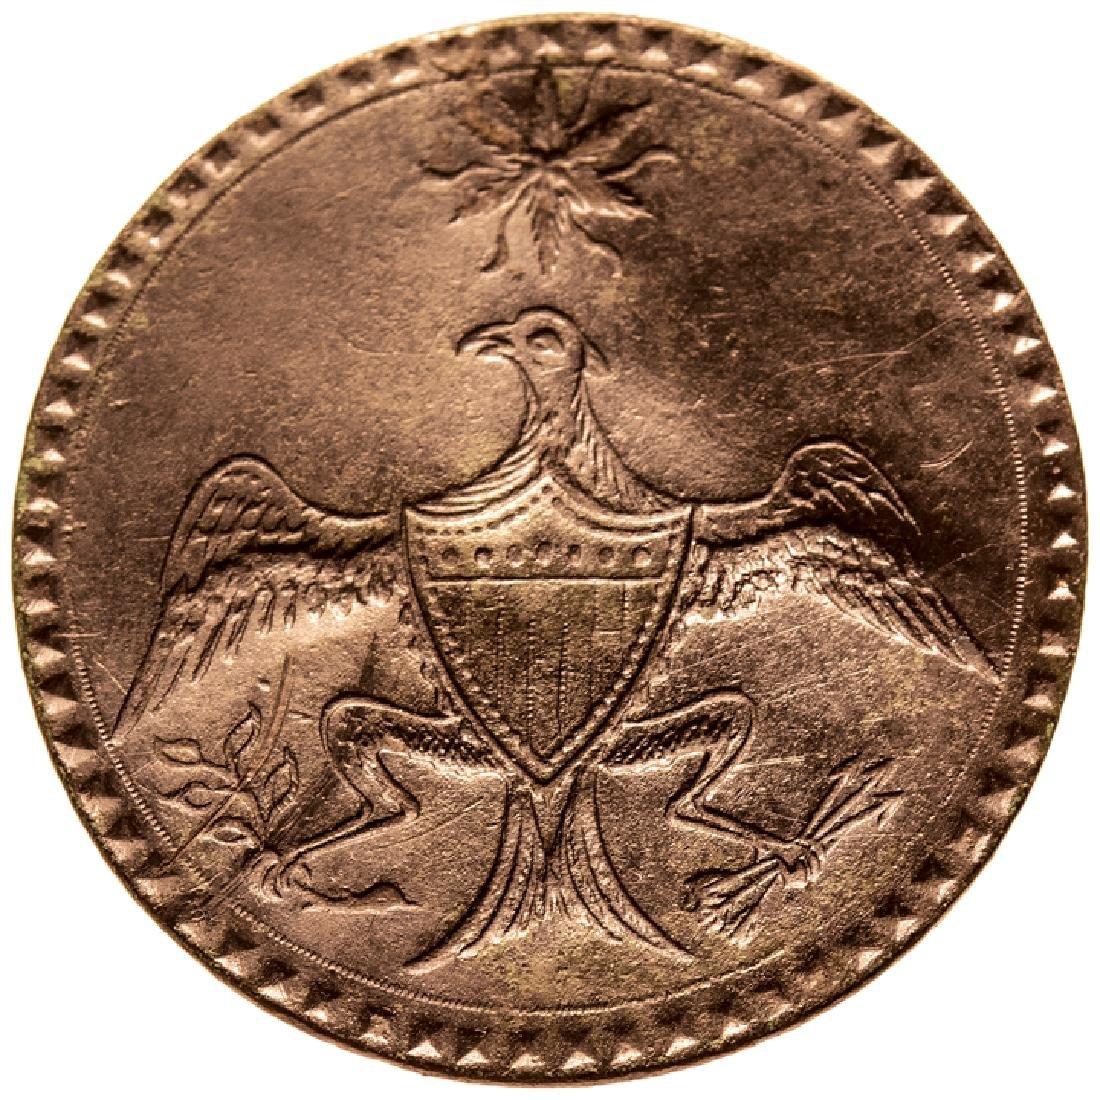 (1789) George Washington Inaugural Brass Button